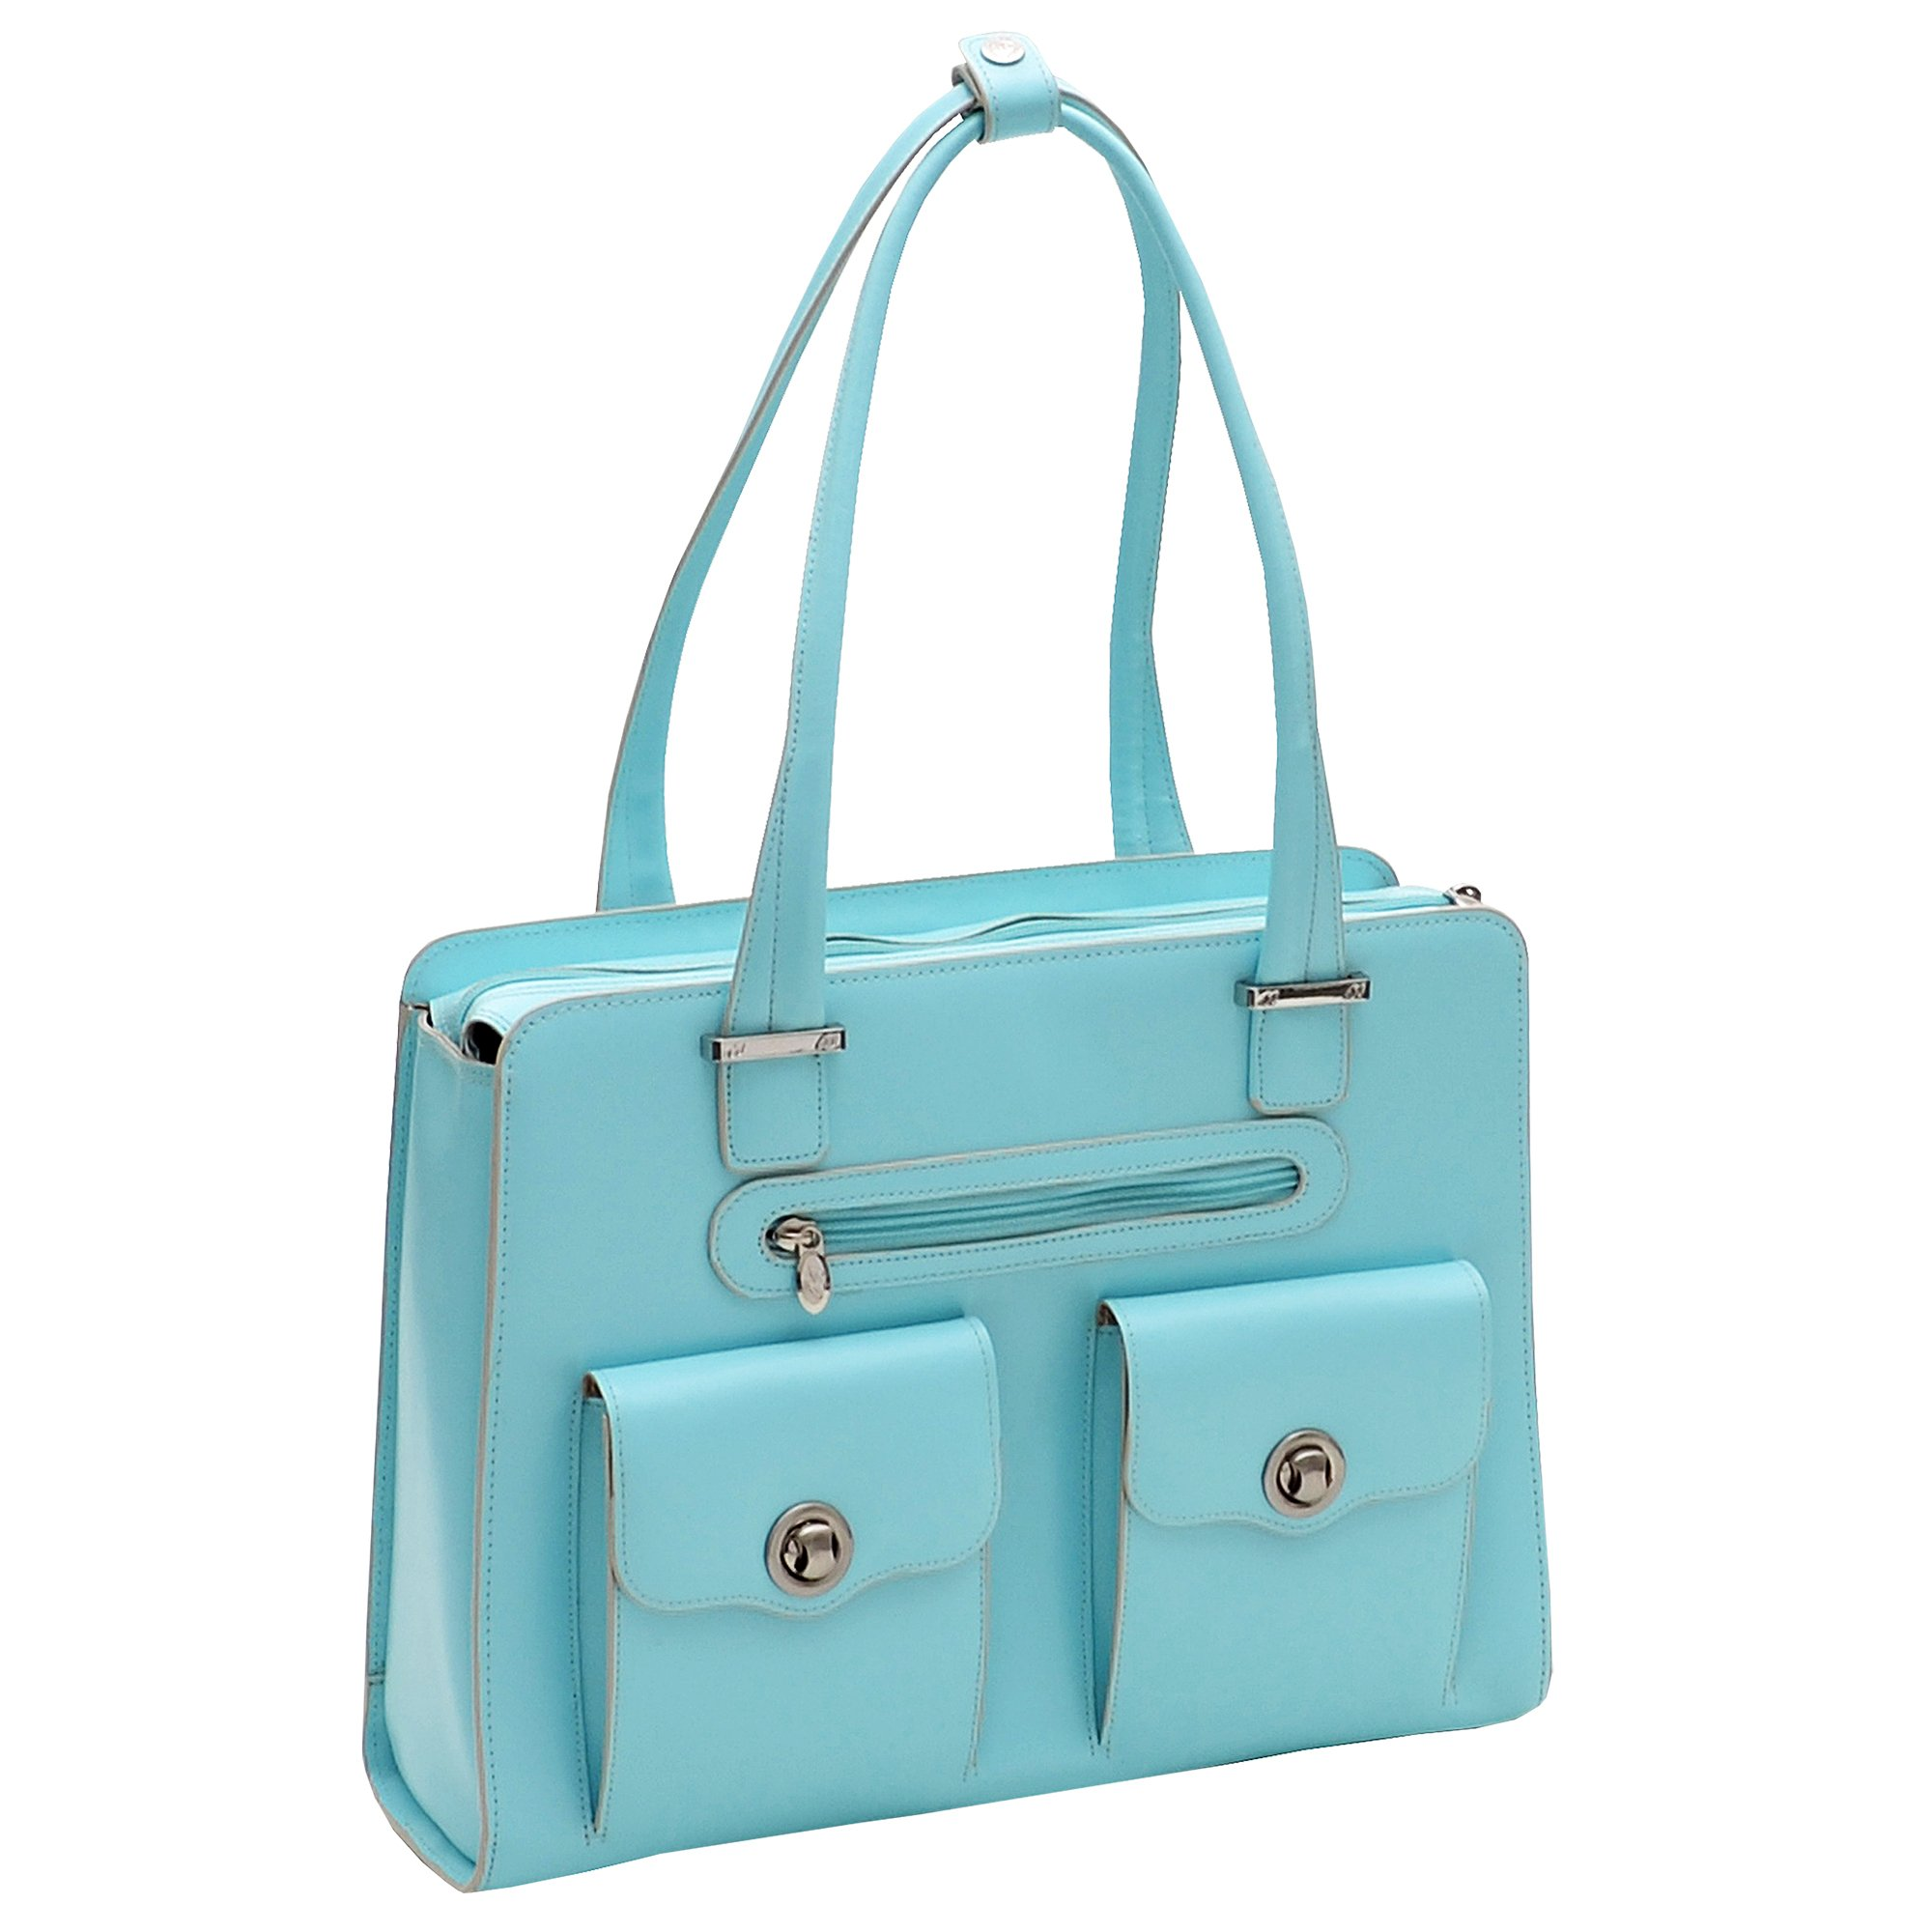 McKleinUSA VERONA 96628 Aqua Blue Leather Fly-Through Checkpoint-Friendly Ladies' Briefcase